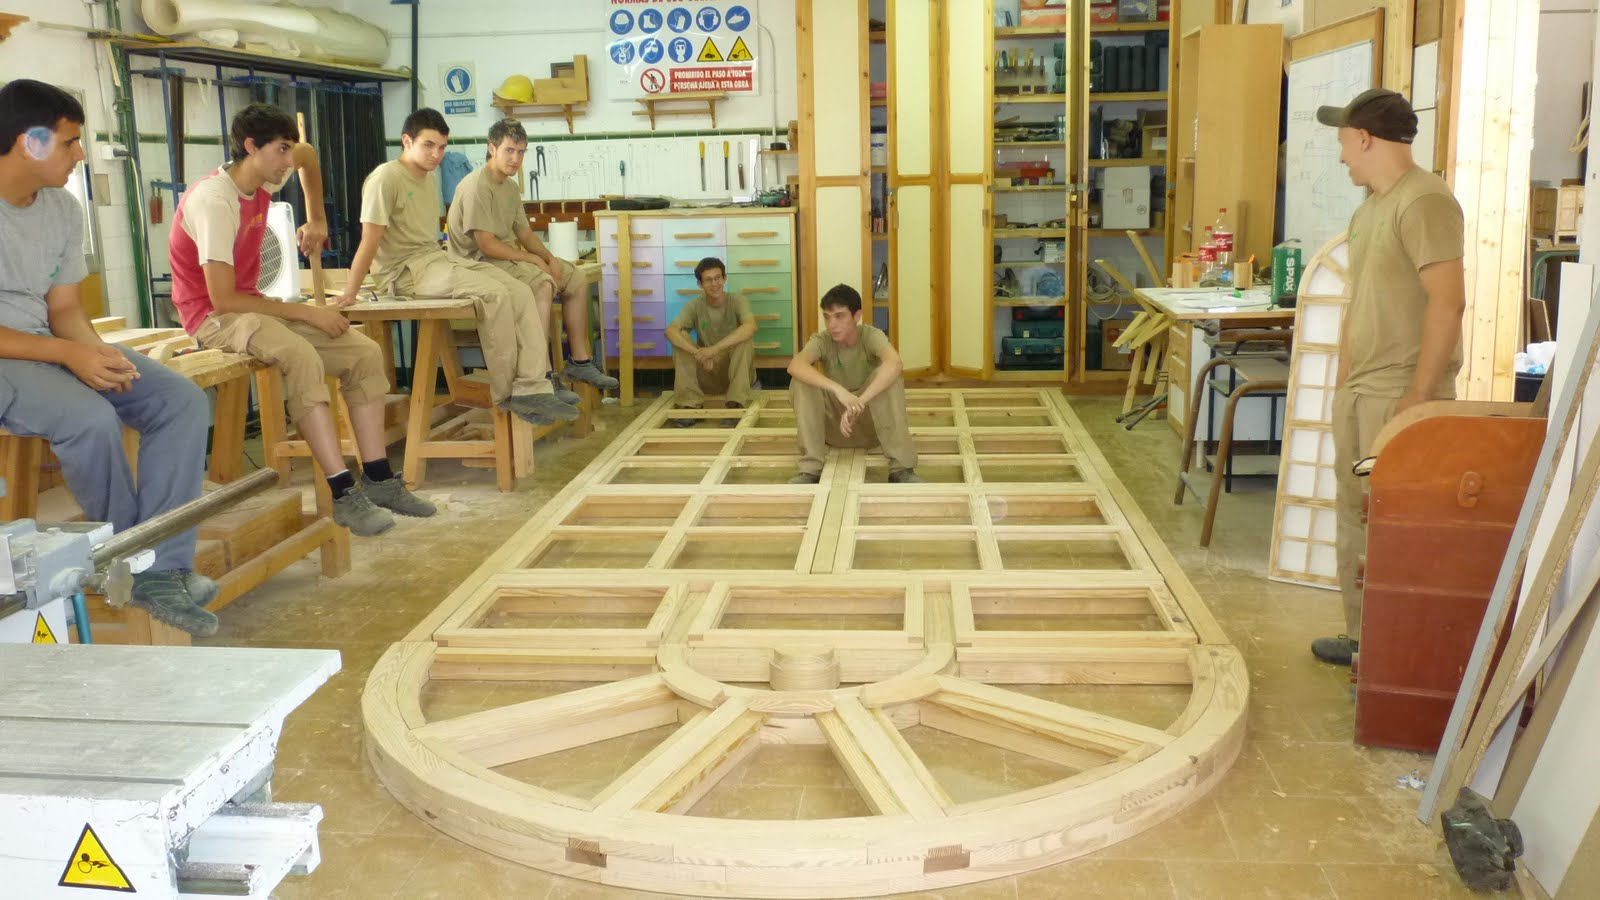 Taller carpinter a madera ventanales nave for Carpinteria en madera